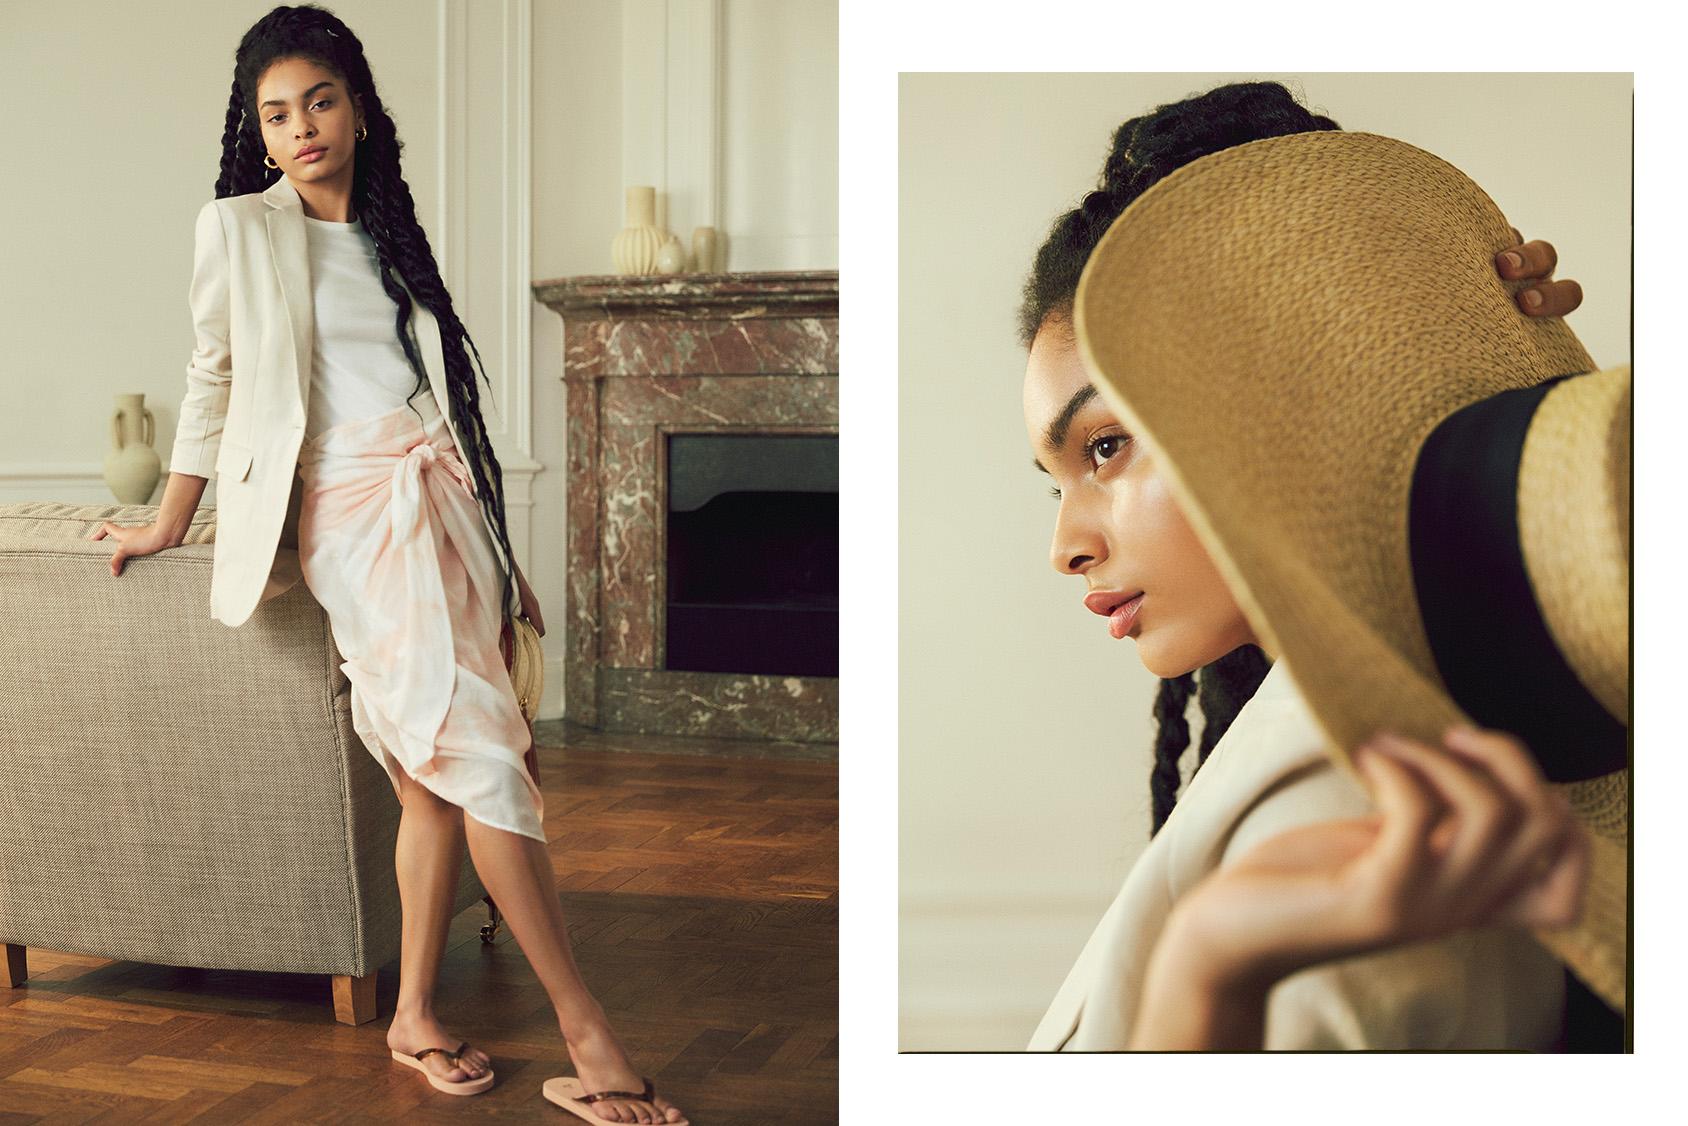 H&M tie-dye sarong